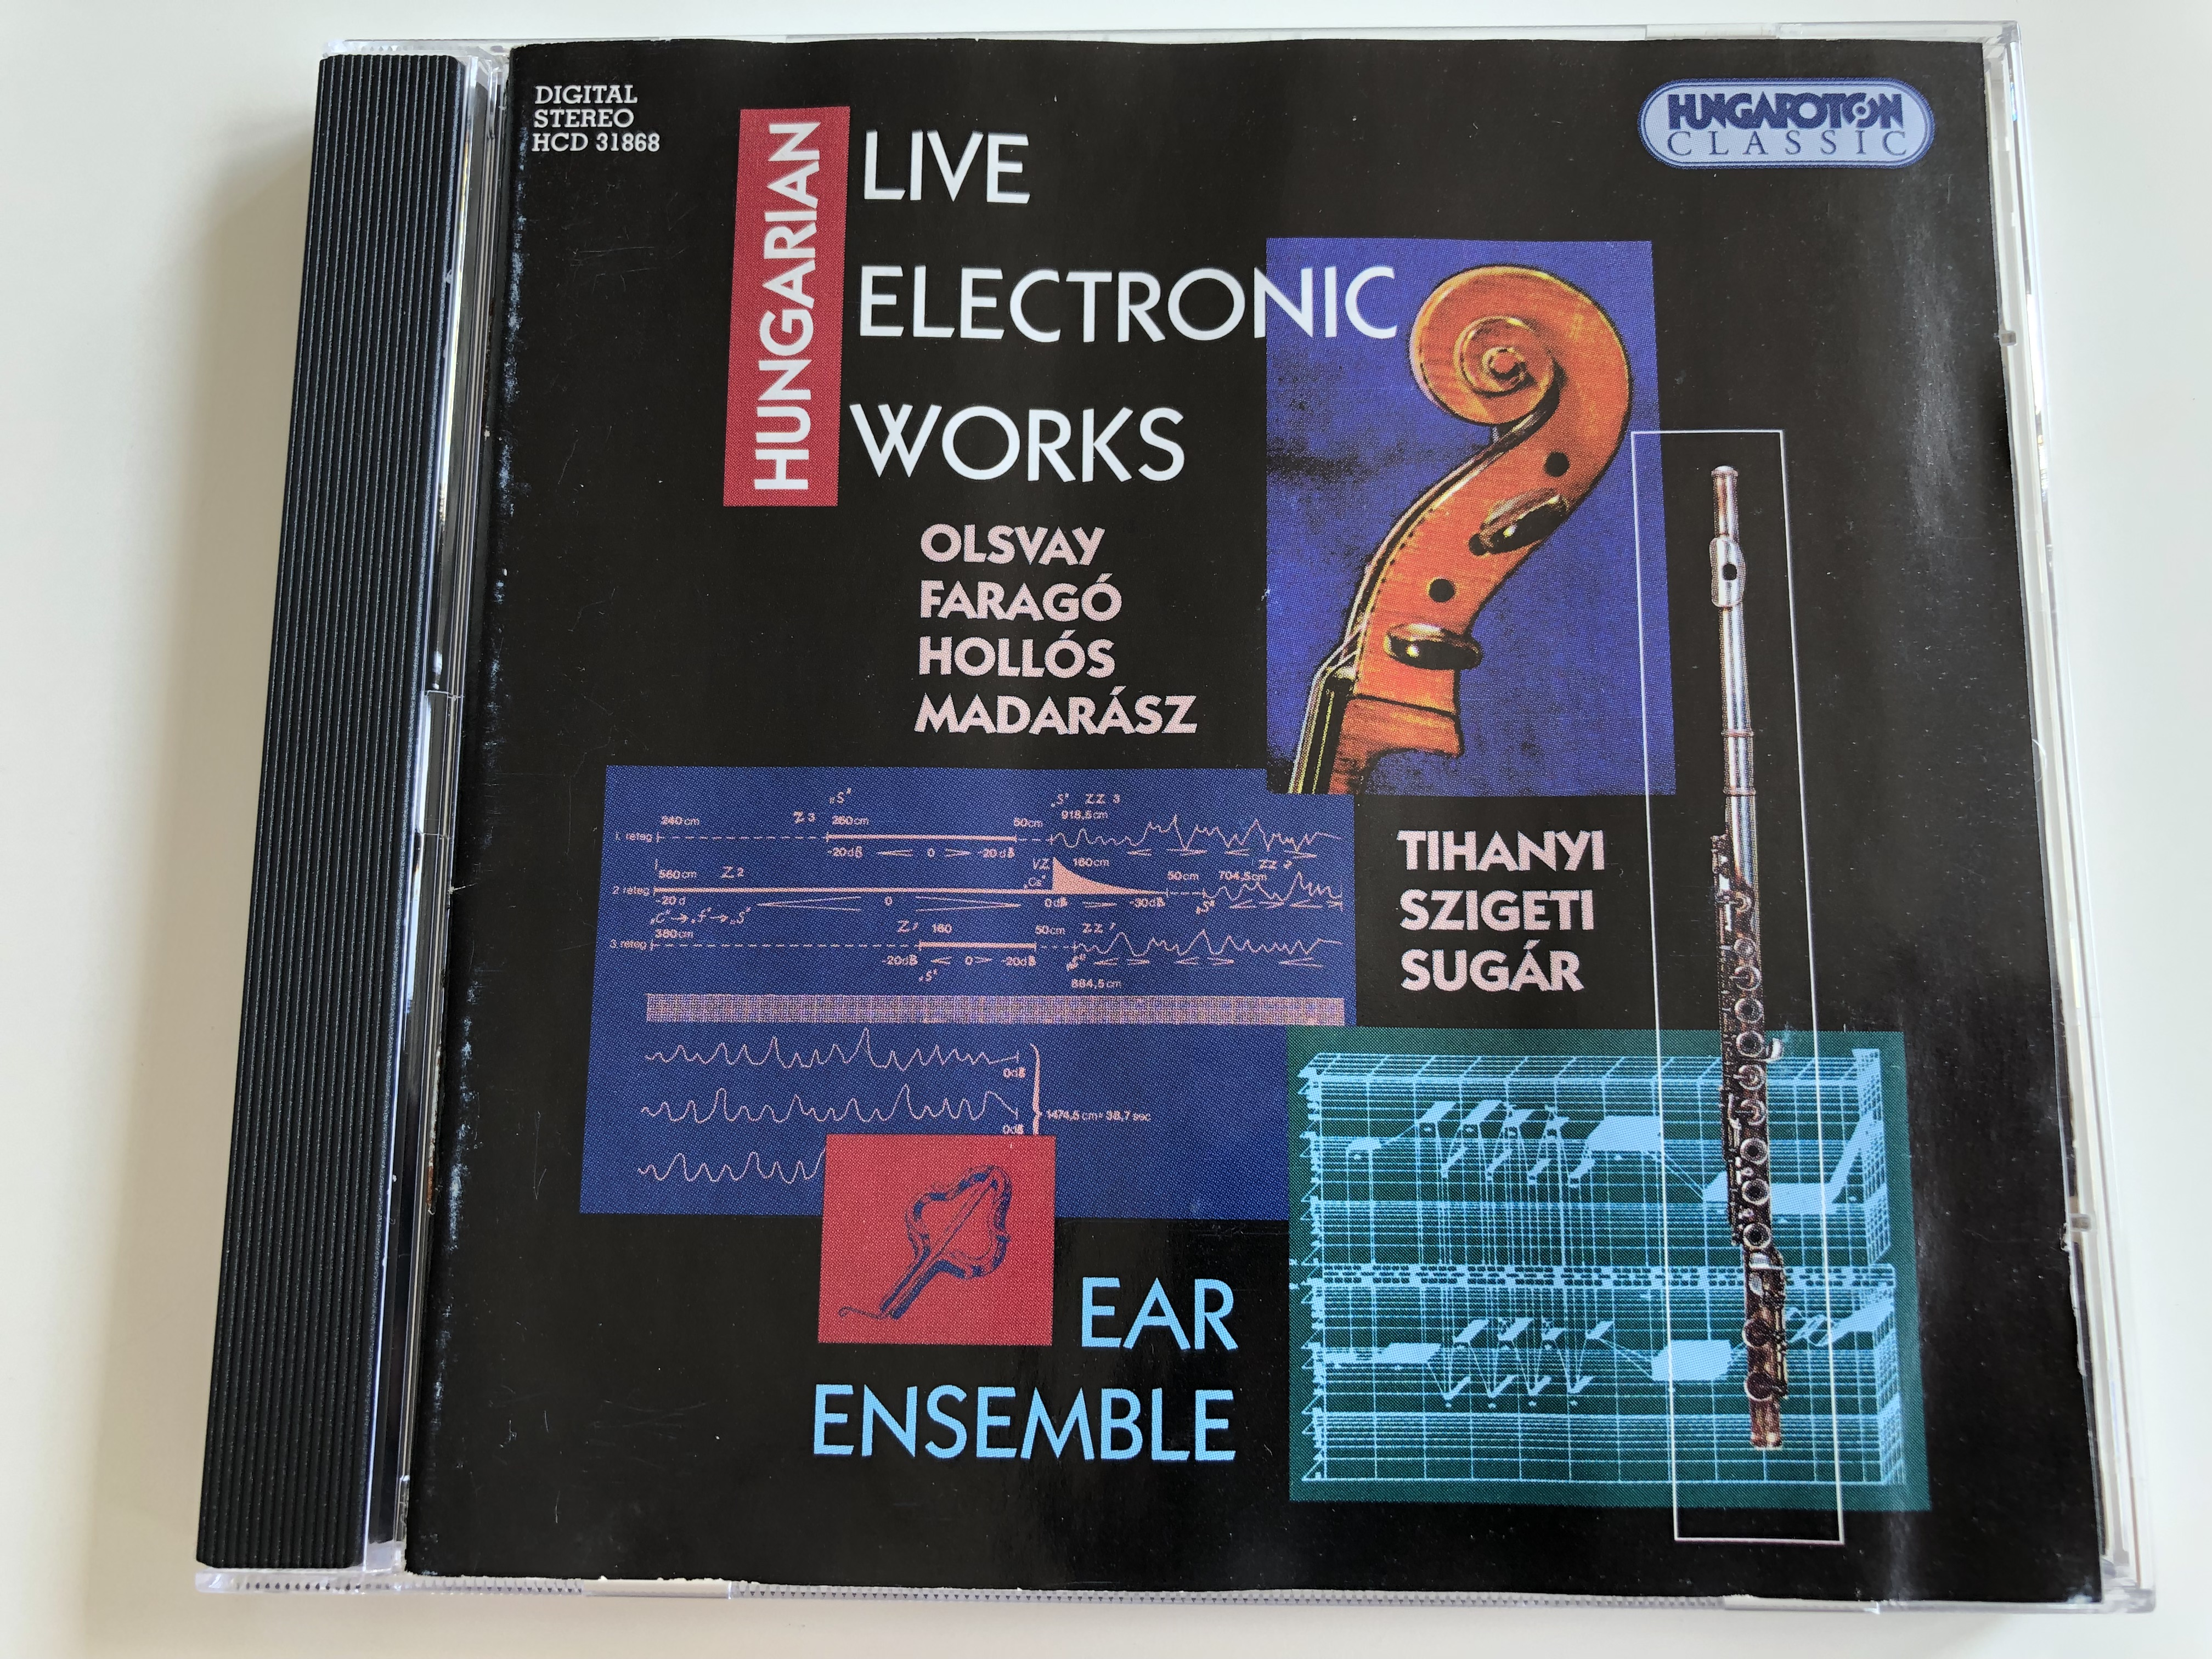 hungarian-live-electronic-works-olsvay-farag-holl-s-madar-sz-tihanyi-szigeti-sug-r-ear-ensemble-hungaroton-classic-audio-cd-2000-hcd-31868-1-.jpg